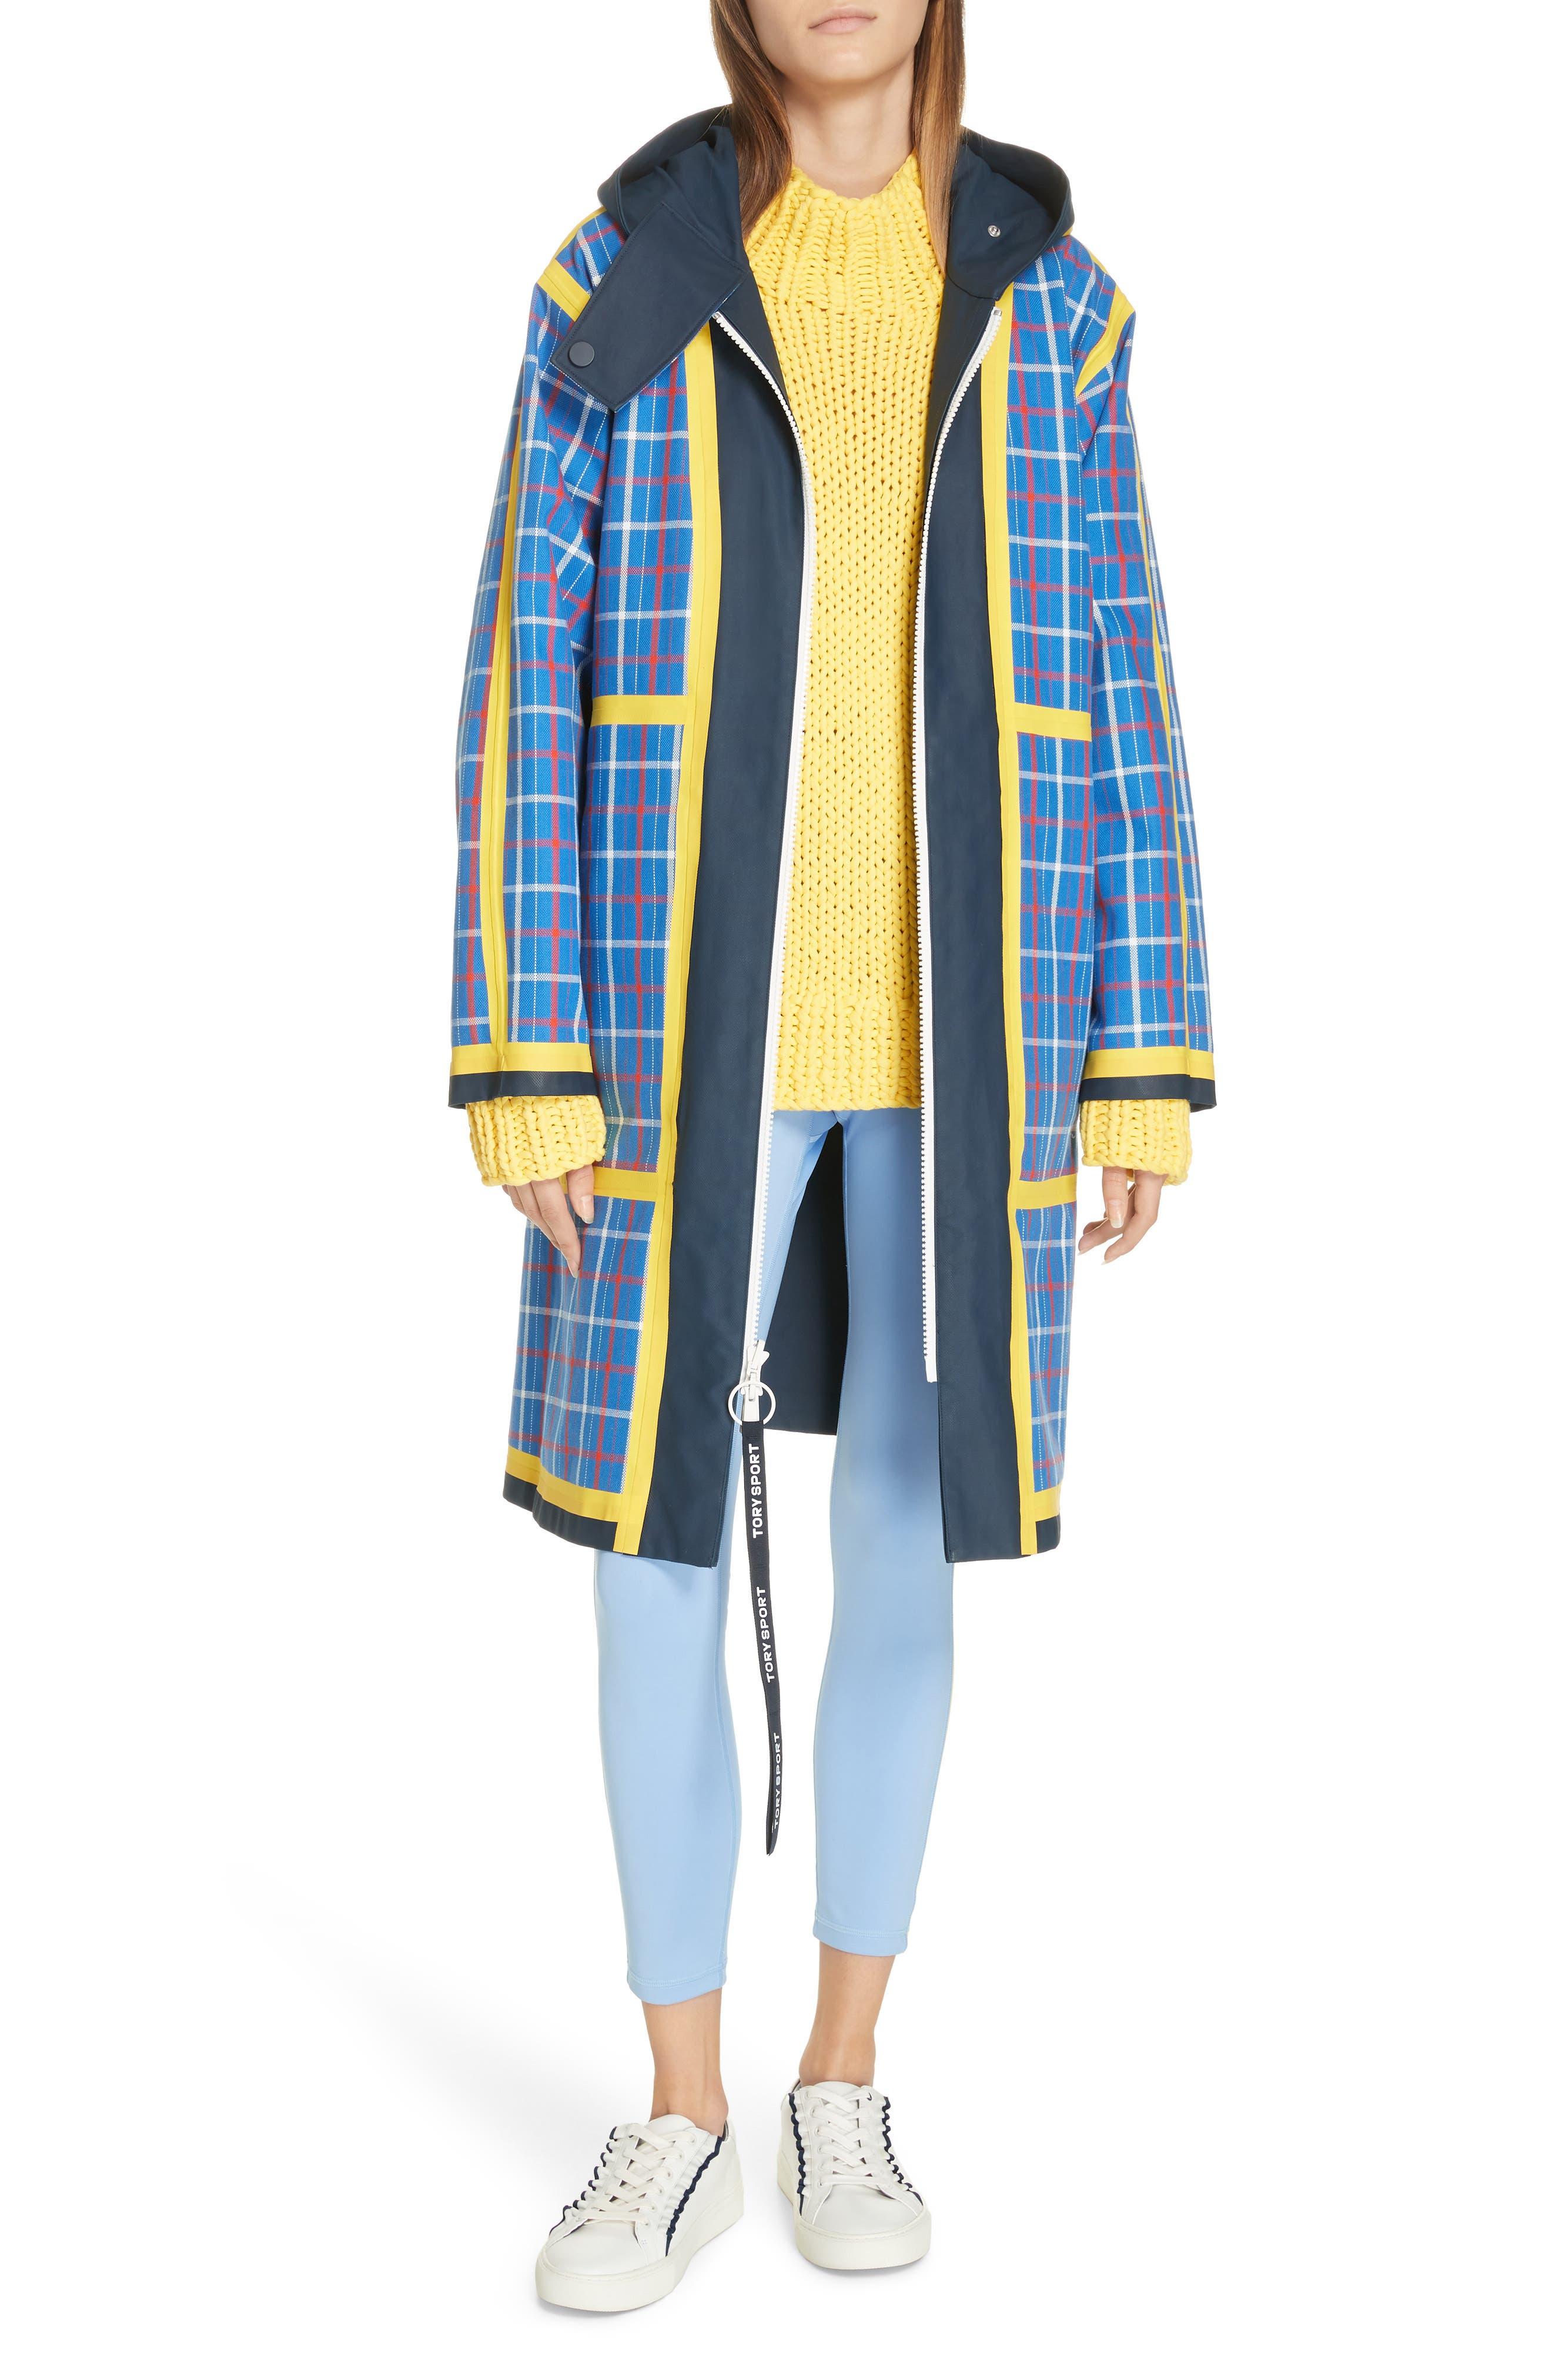 TORY SPORT, Reversible Coated Canvas Rain Coat, Alternate thumbnail 9, color, TANDEM PLAID LARGE SURF BLUE